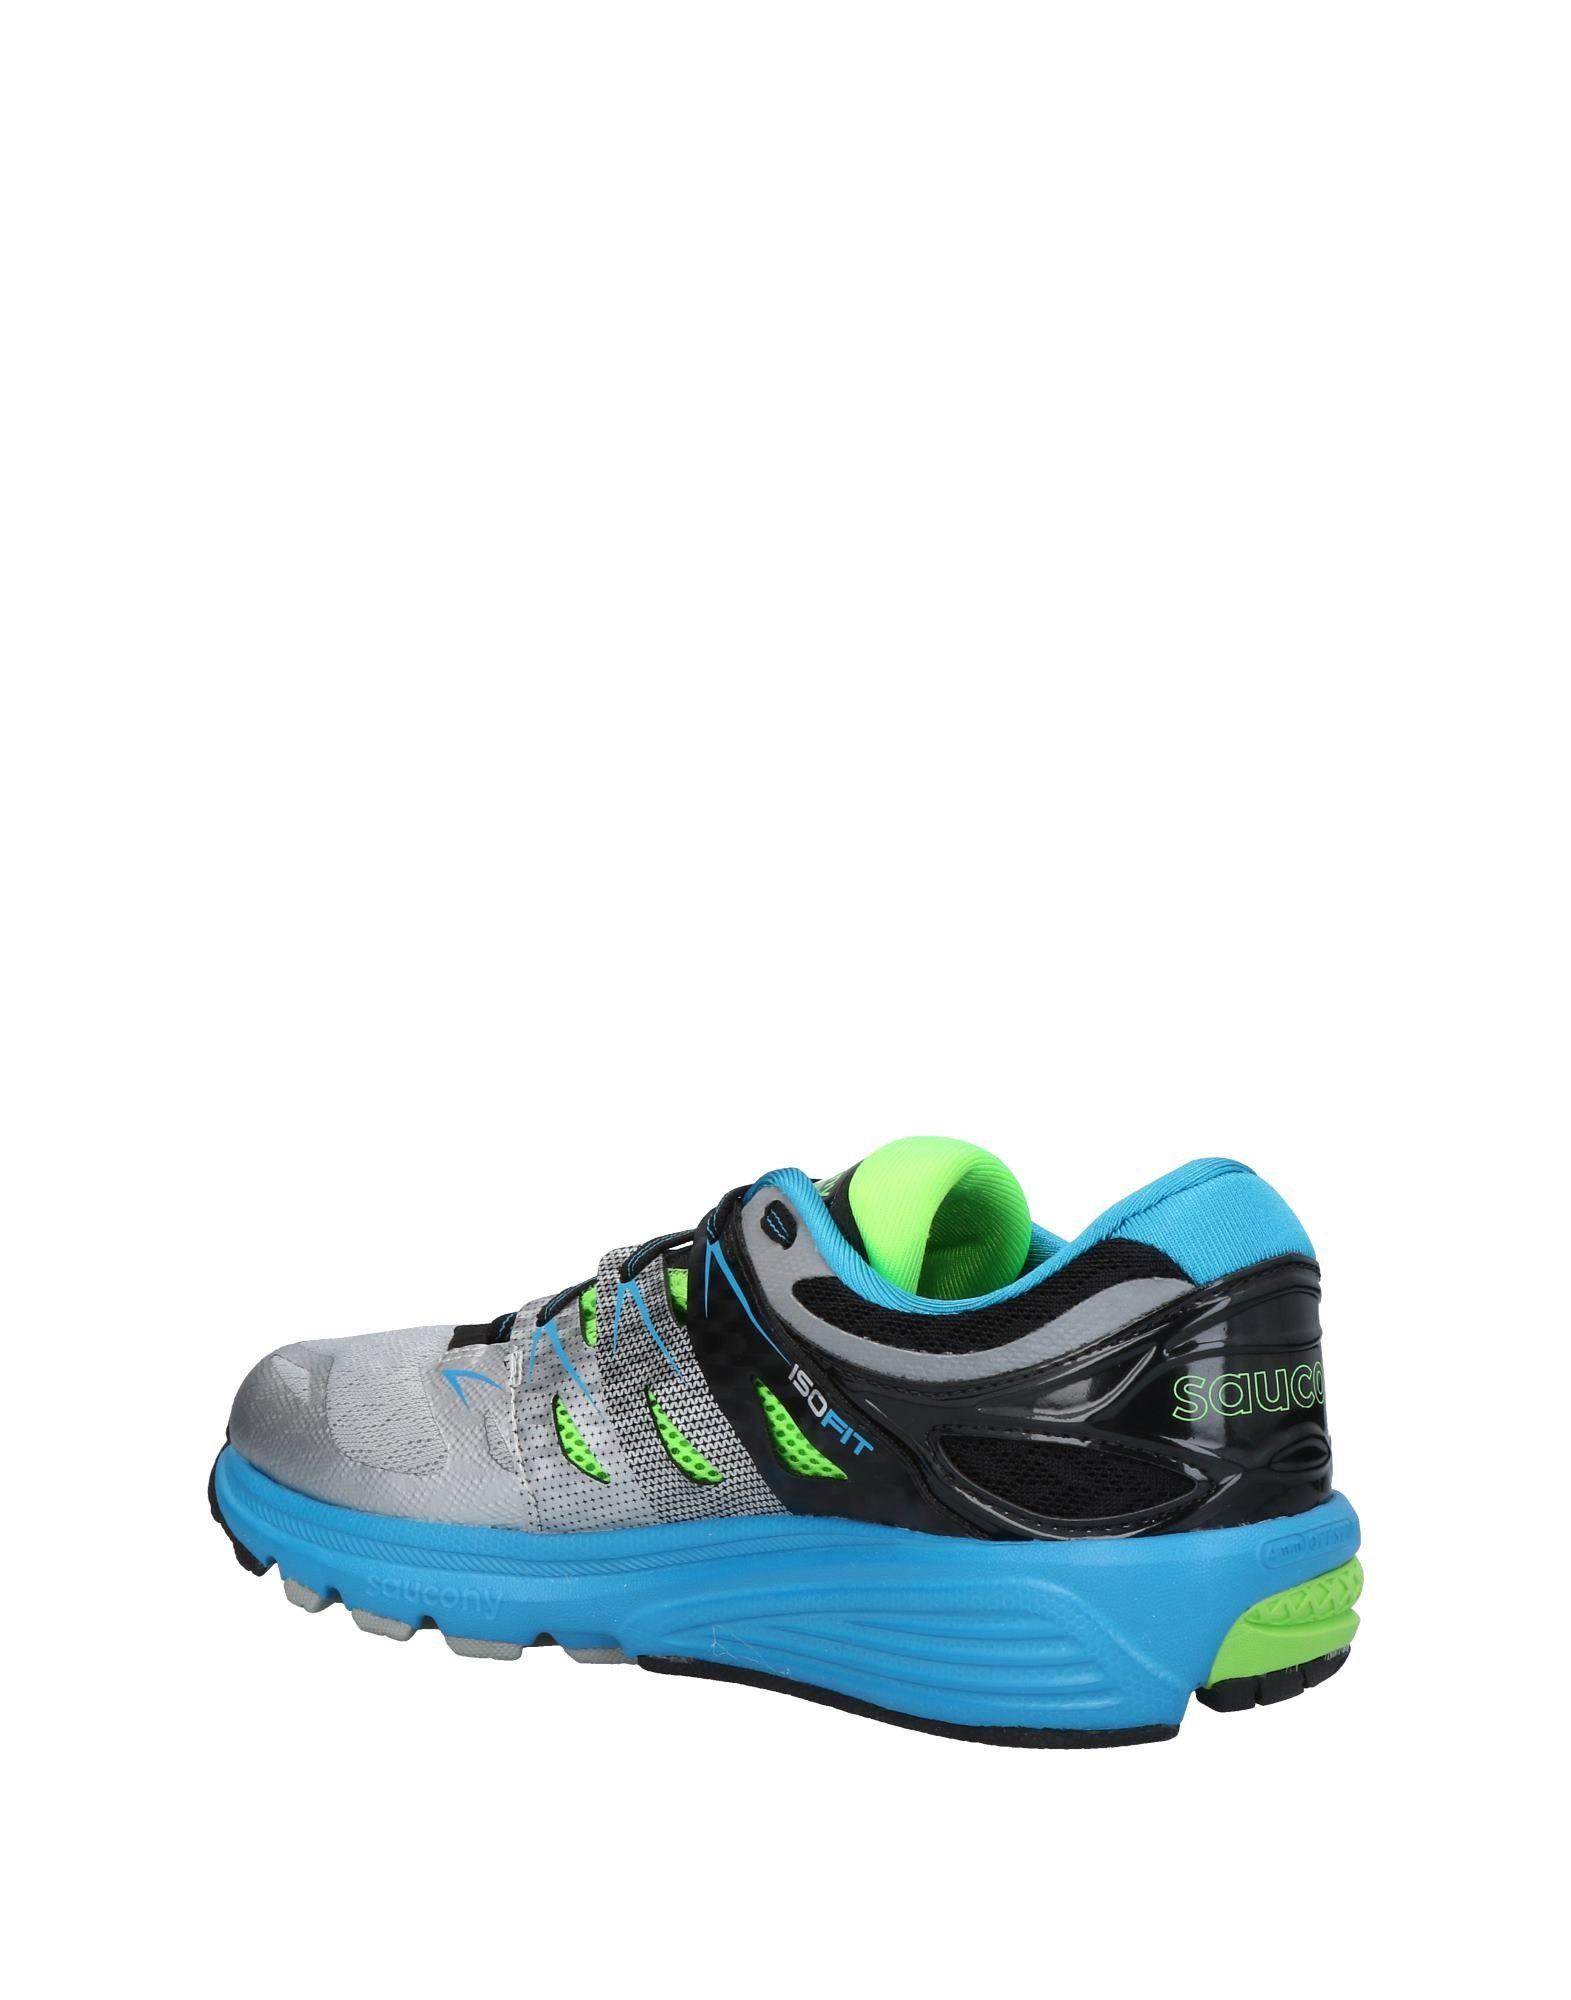 Saucony Sneakers Preis-Leistungs-Verhältnis, Herren Gutes Preis-Leistungs-Verhältnis, Sneakers es lohnt sich 79f46a